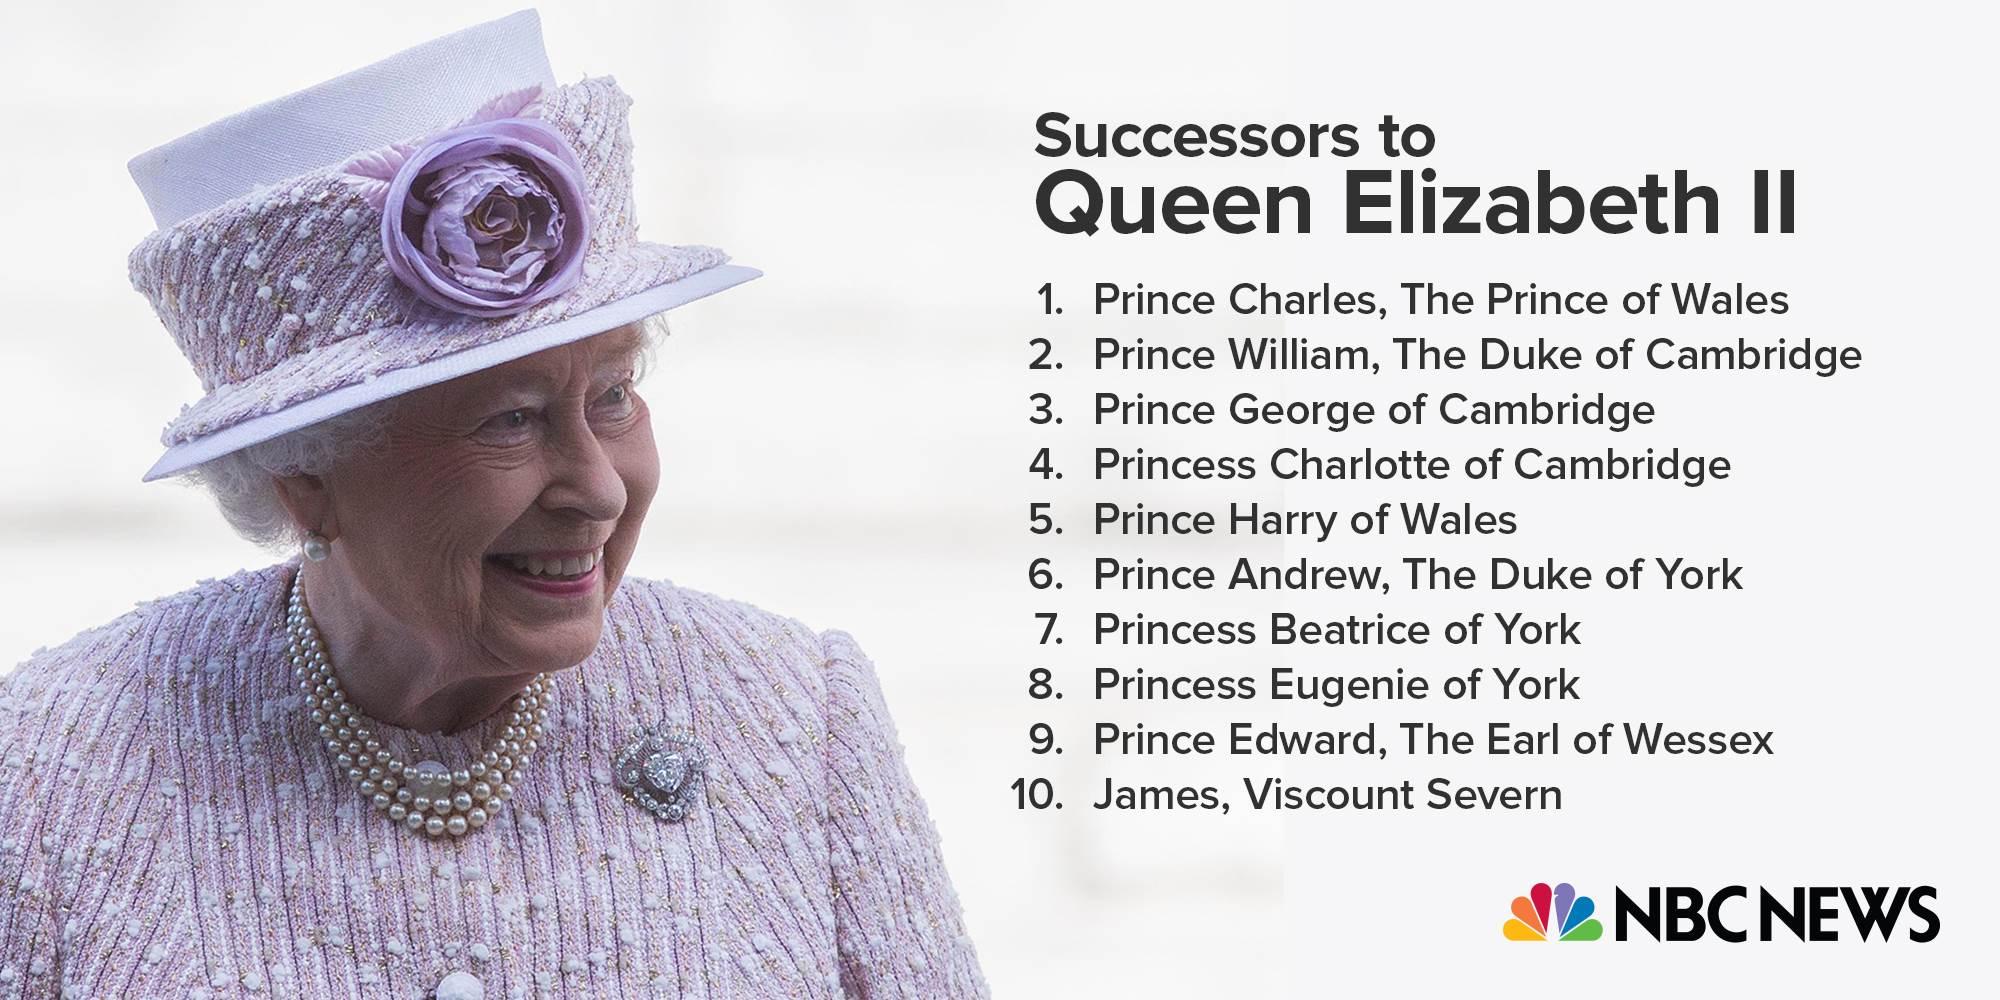 Queen Elizabeth's successors